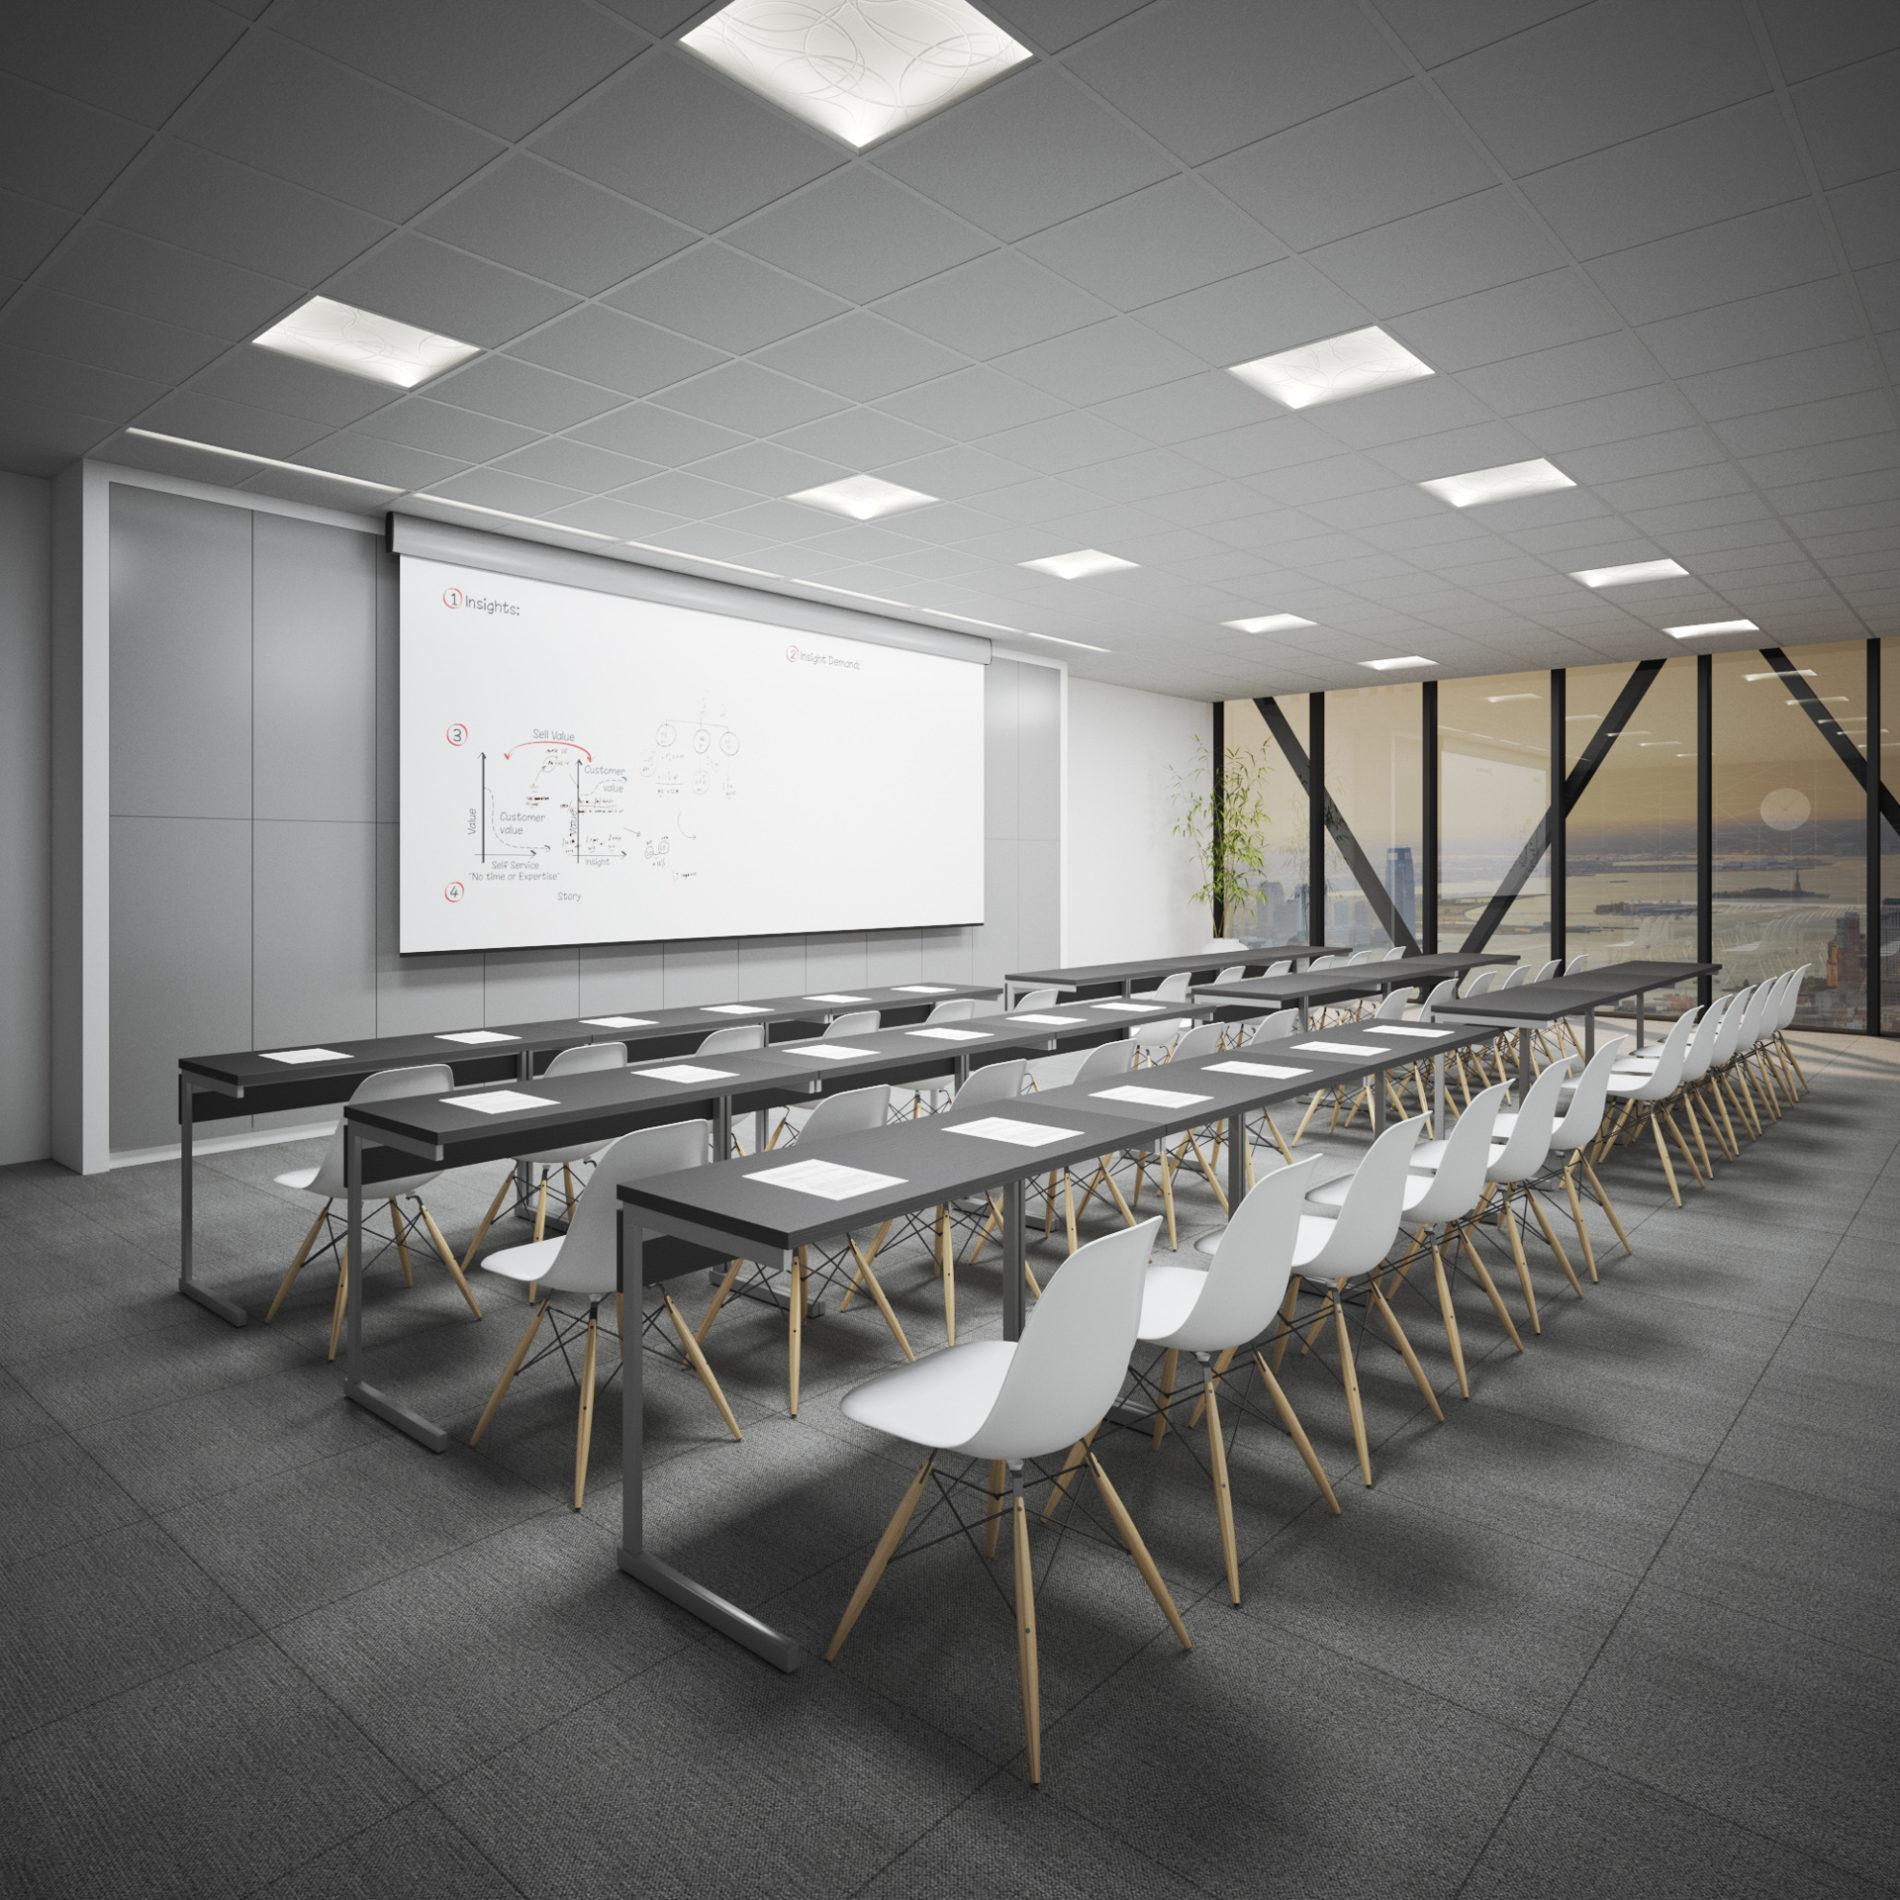 18-012c02v20 - Training Room_WEB